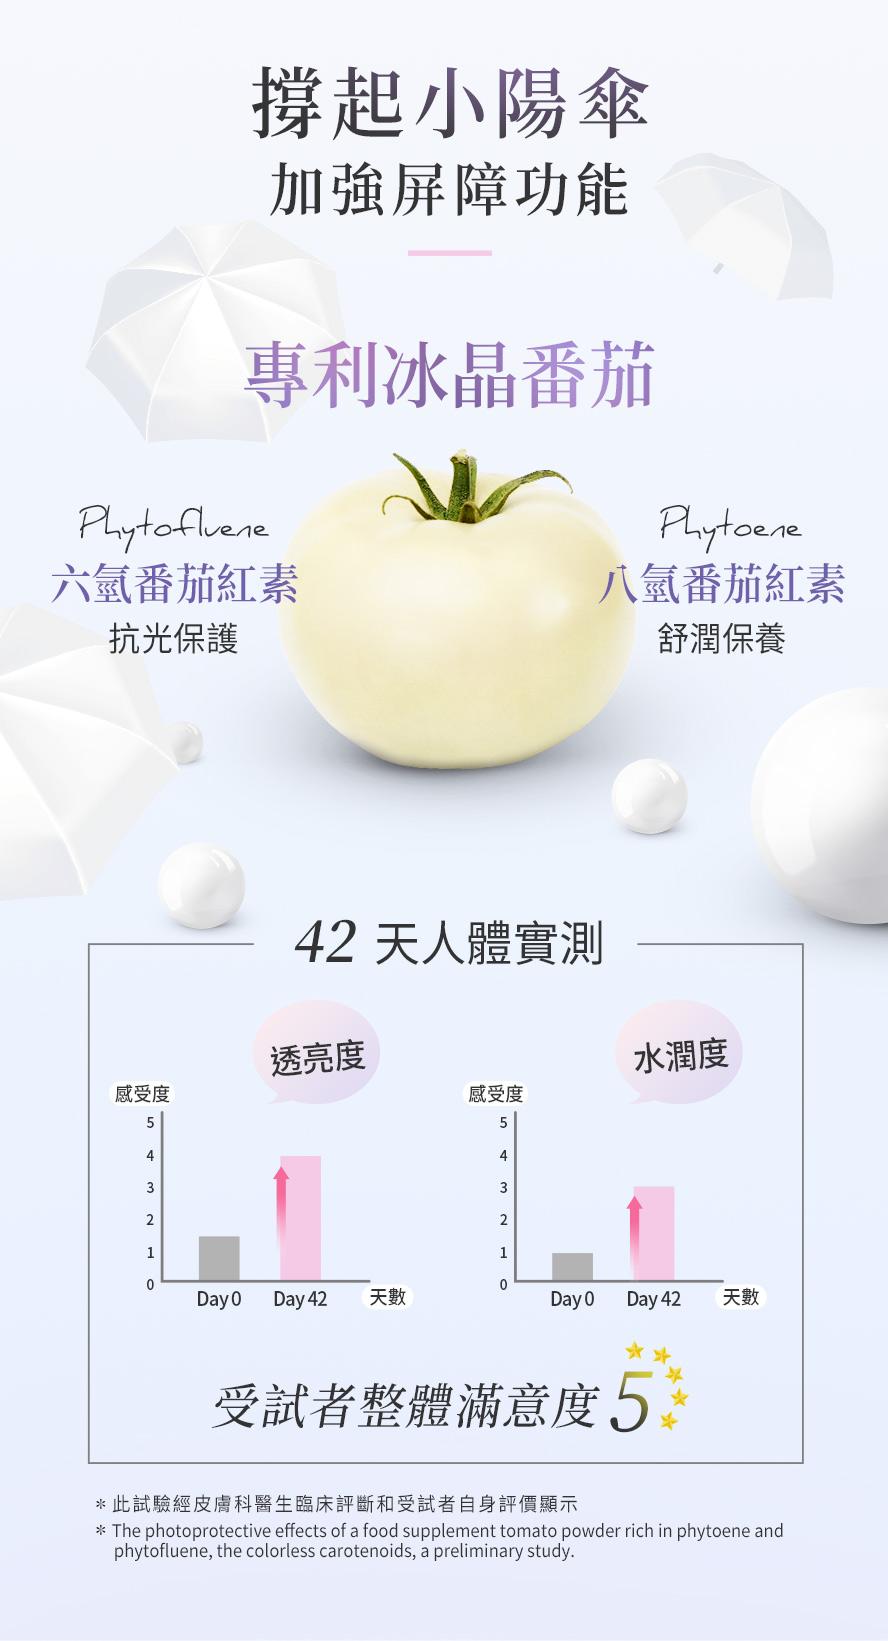 BHK極奢晶透粉添加高濃度冰晶番茄,可吸收UVA與UVB,避免曬黑與曬傷。